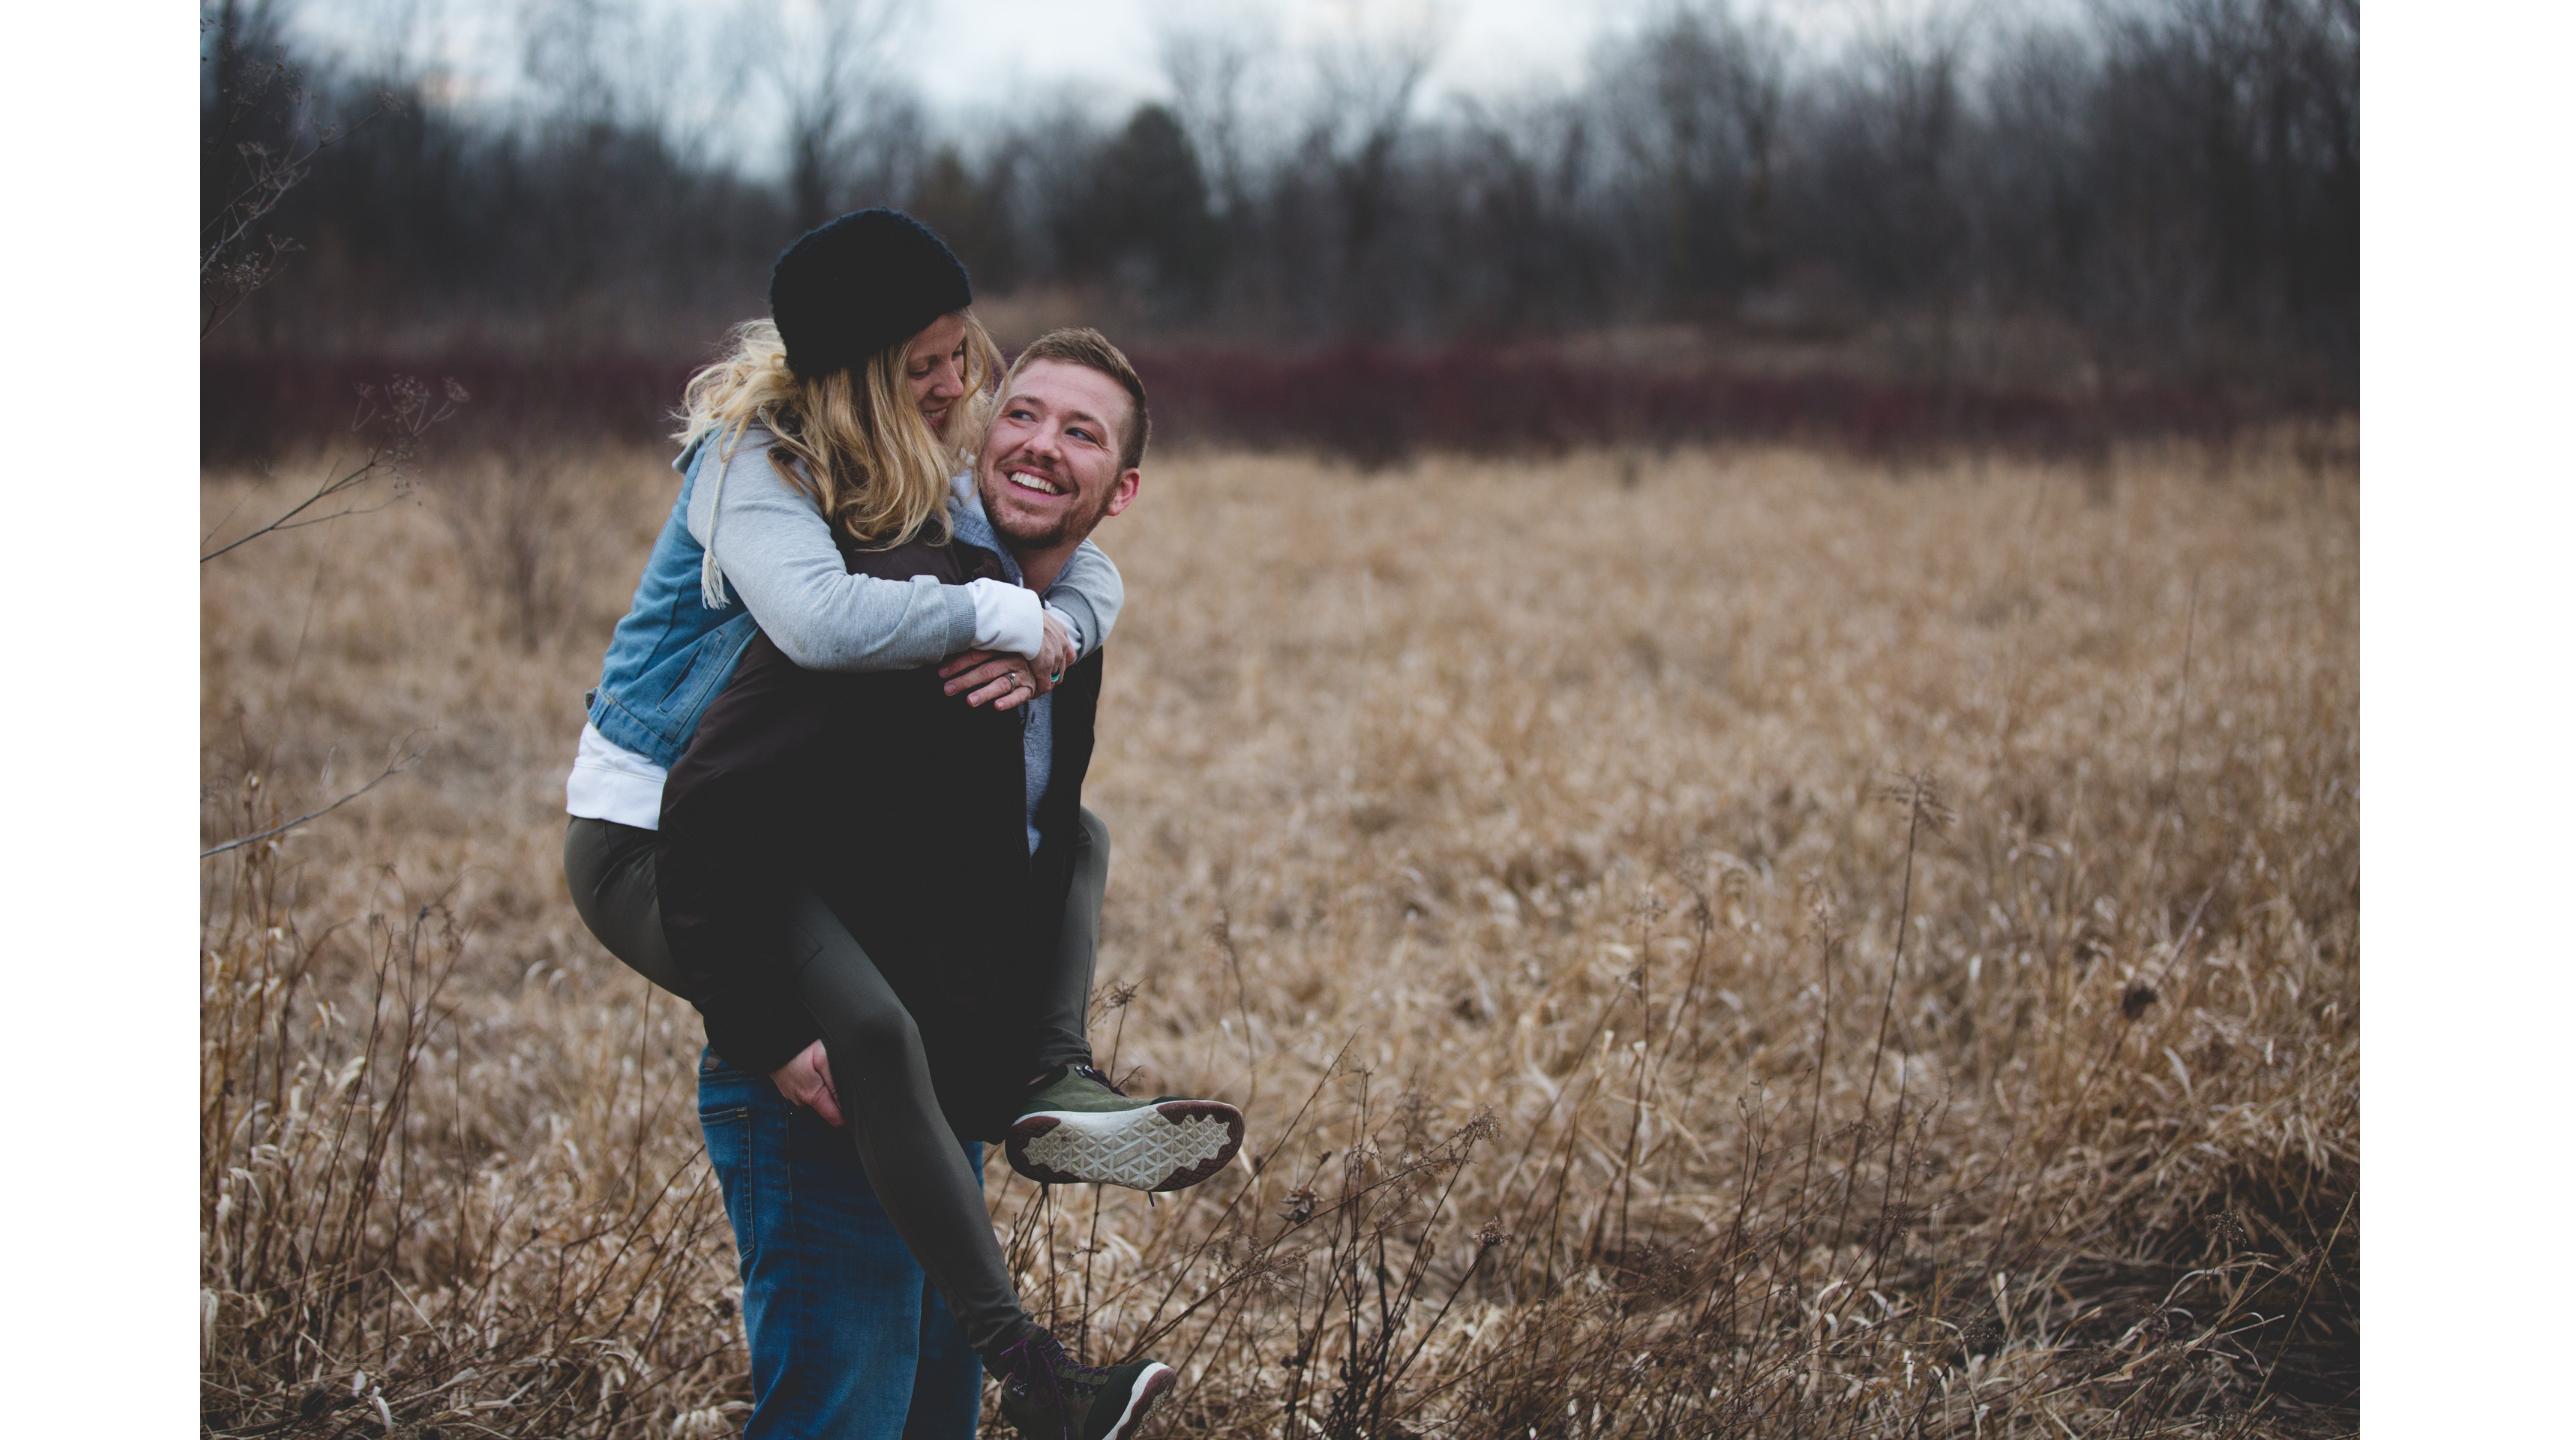 Couple dating websites dubai professional dating